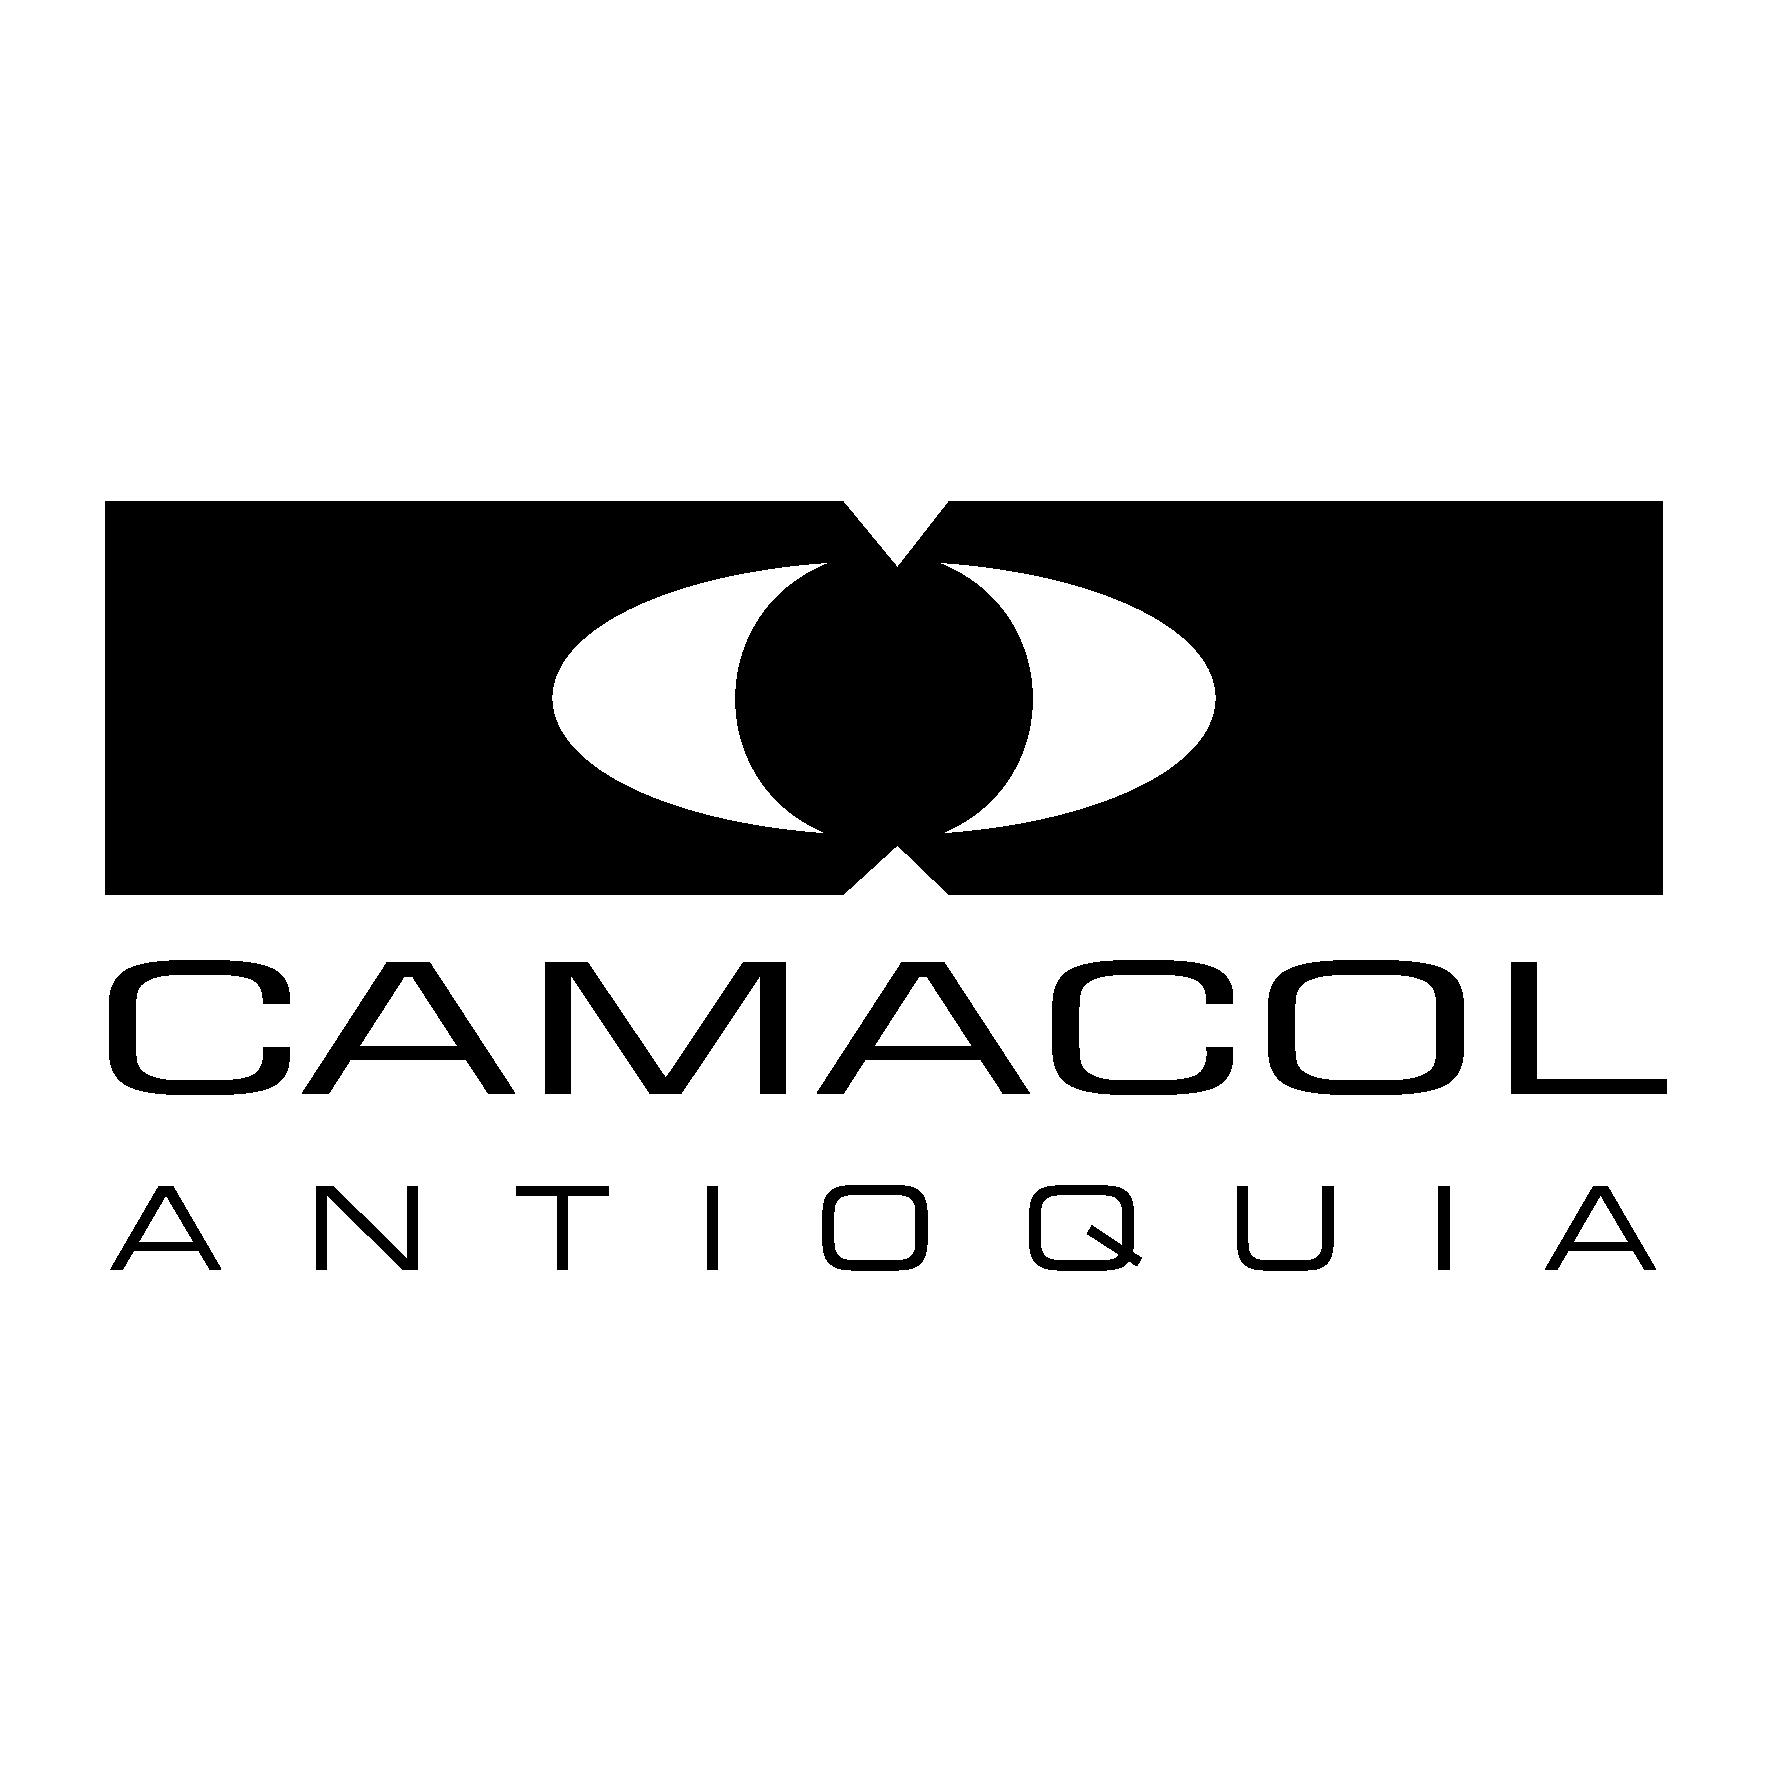 Logocamacolnegro15544142871554414287